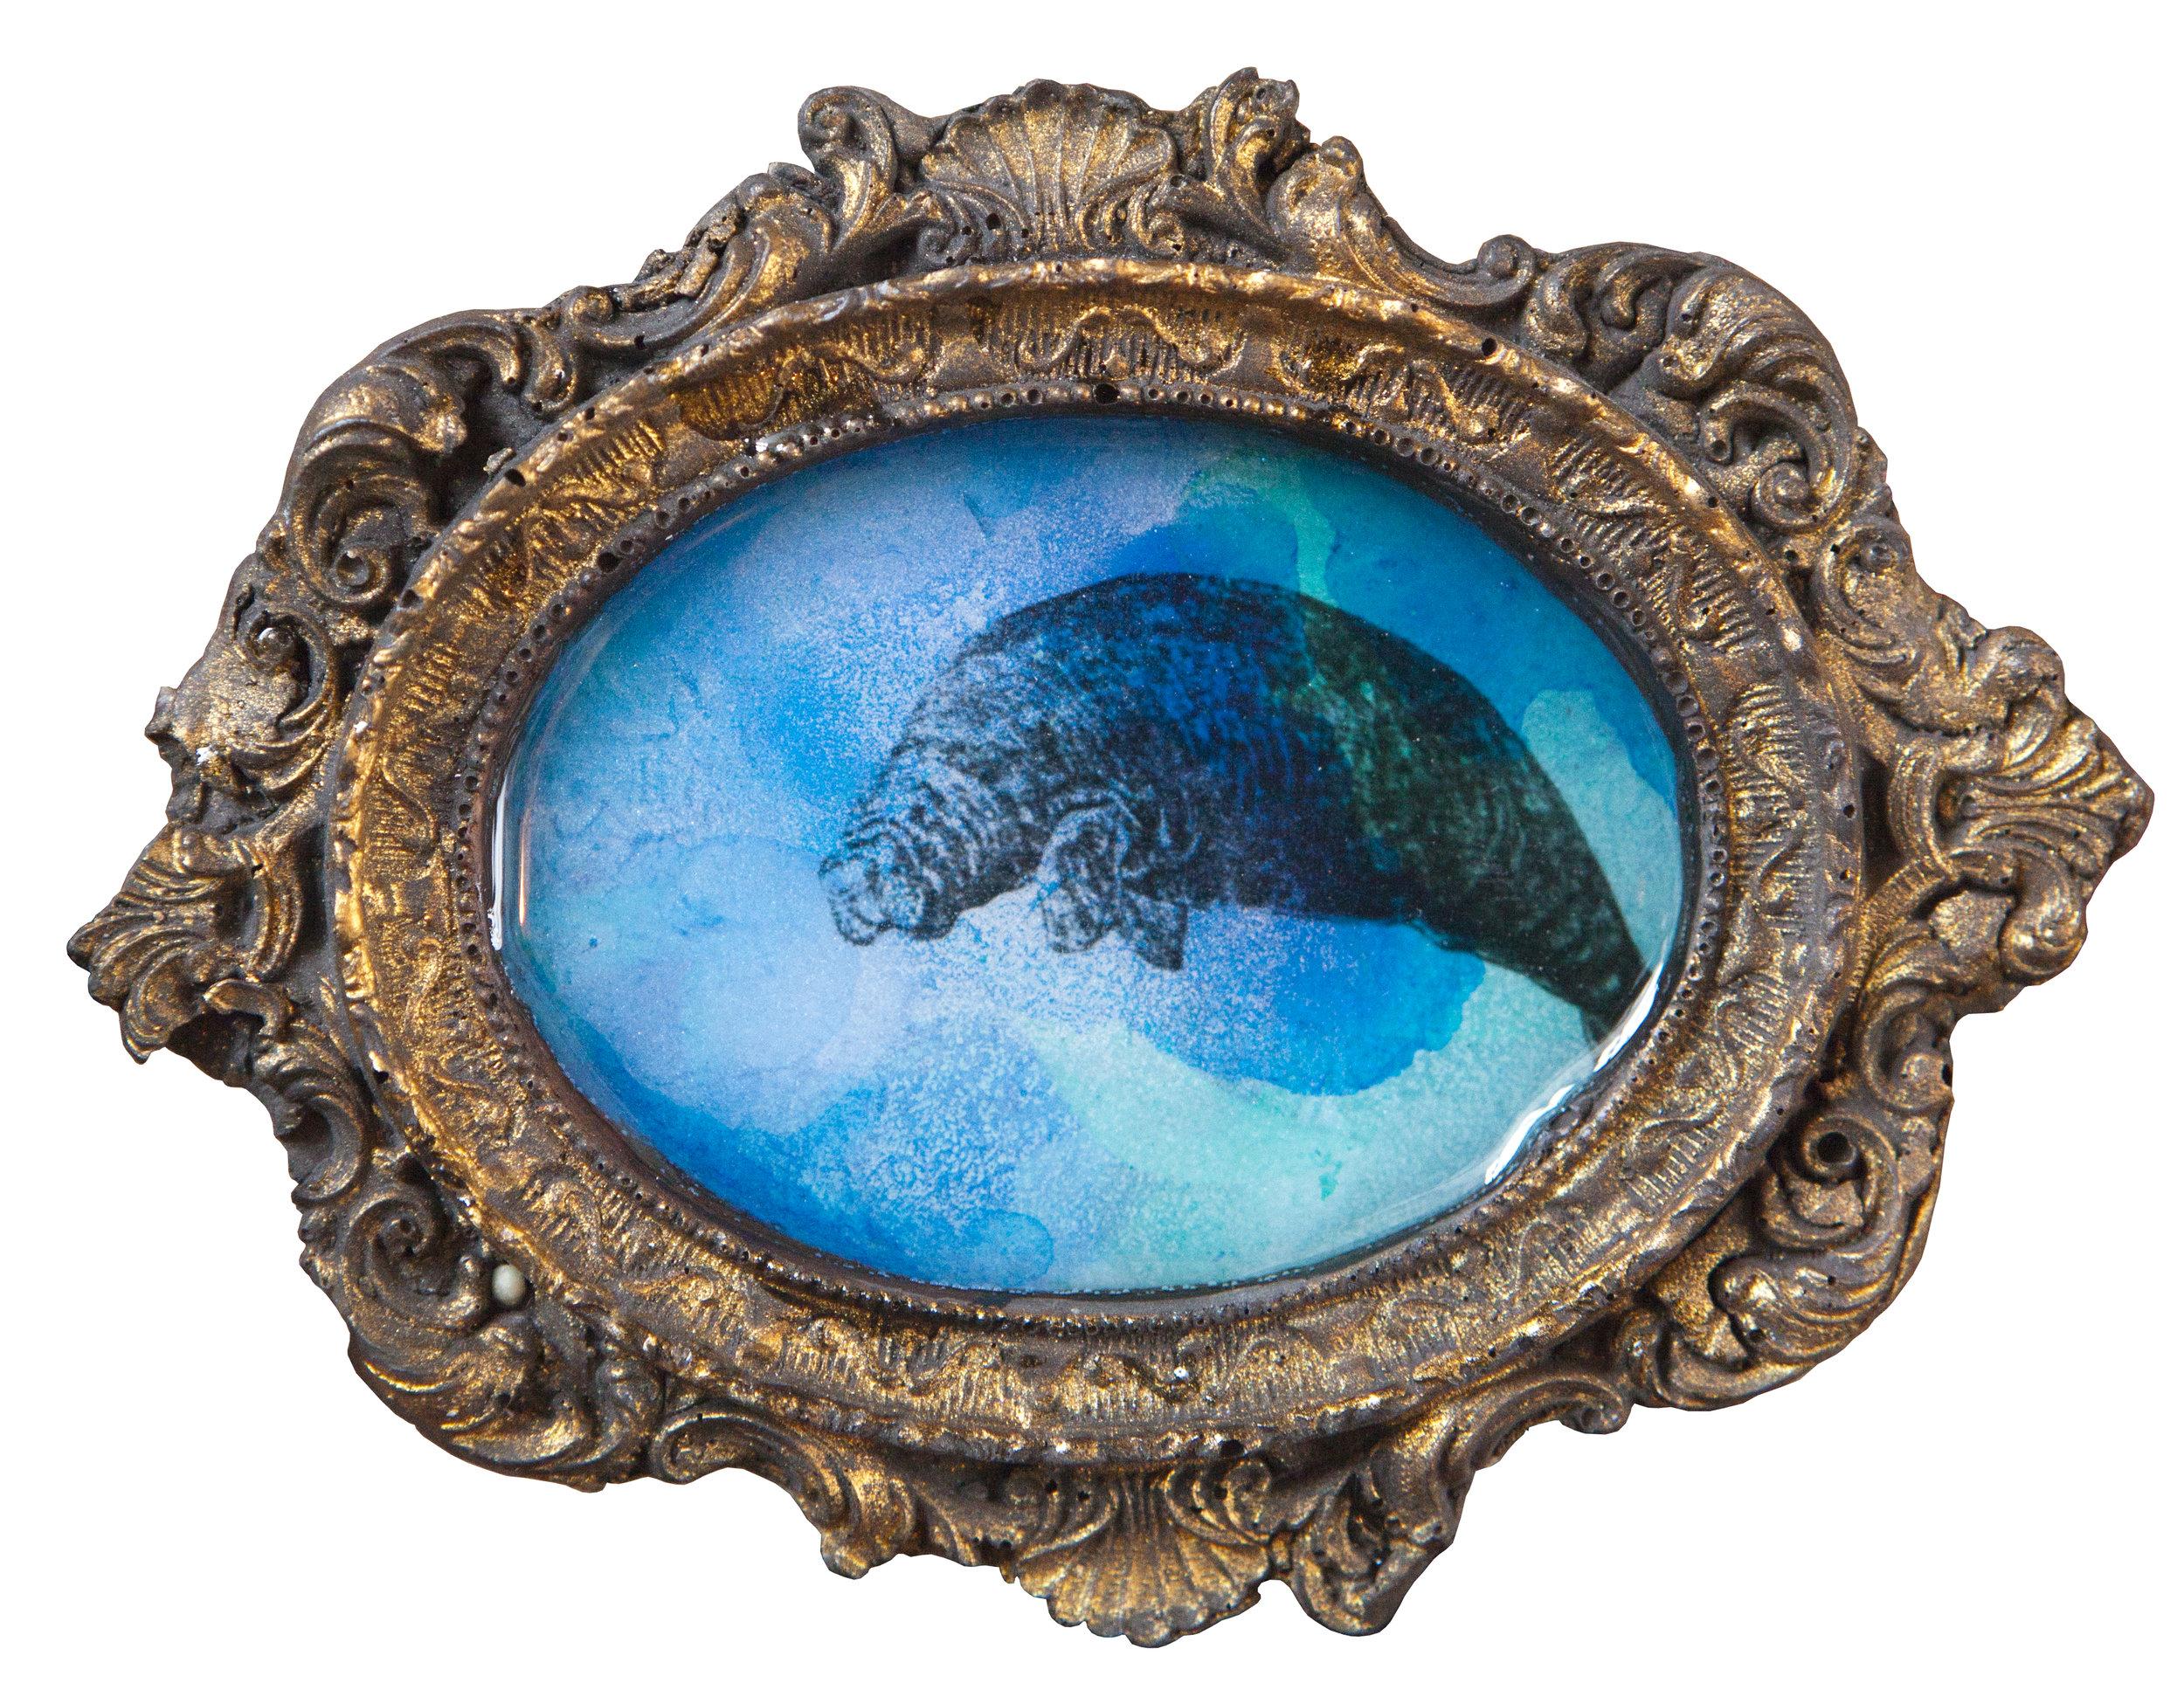 Shiraz Bayjoo   Dugong   Acrylic on board, resin, jesmonite  14 x 10 x 1 cm  2017